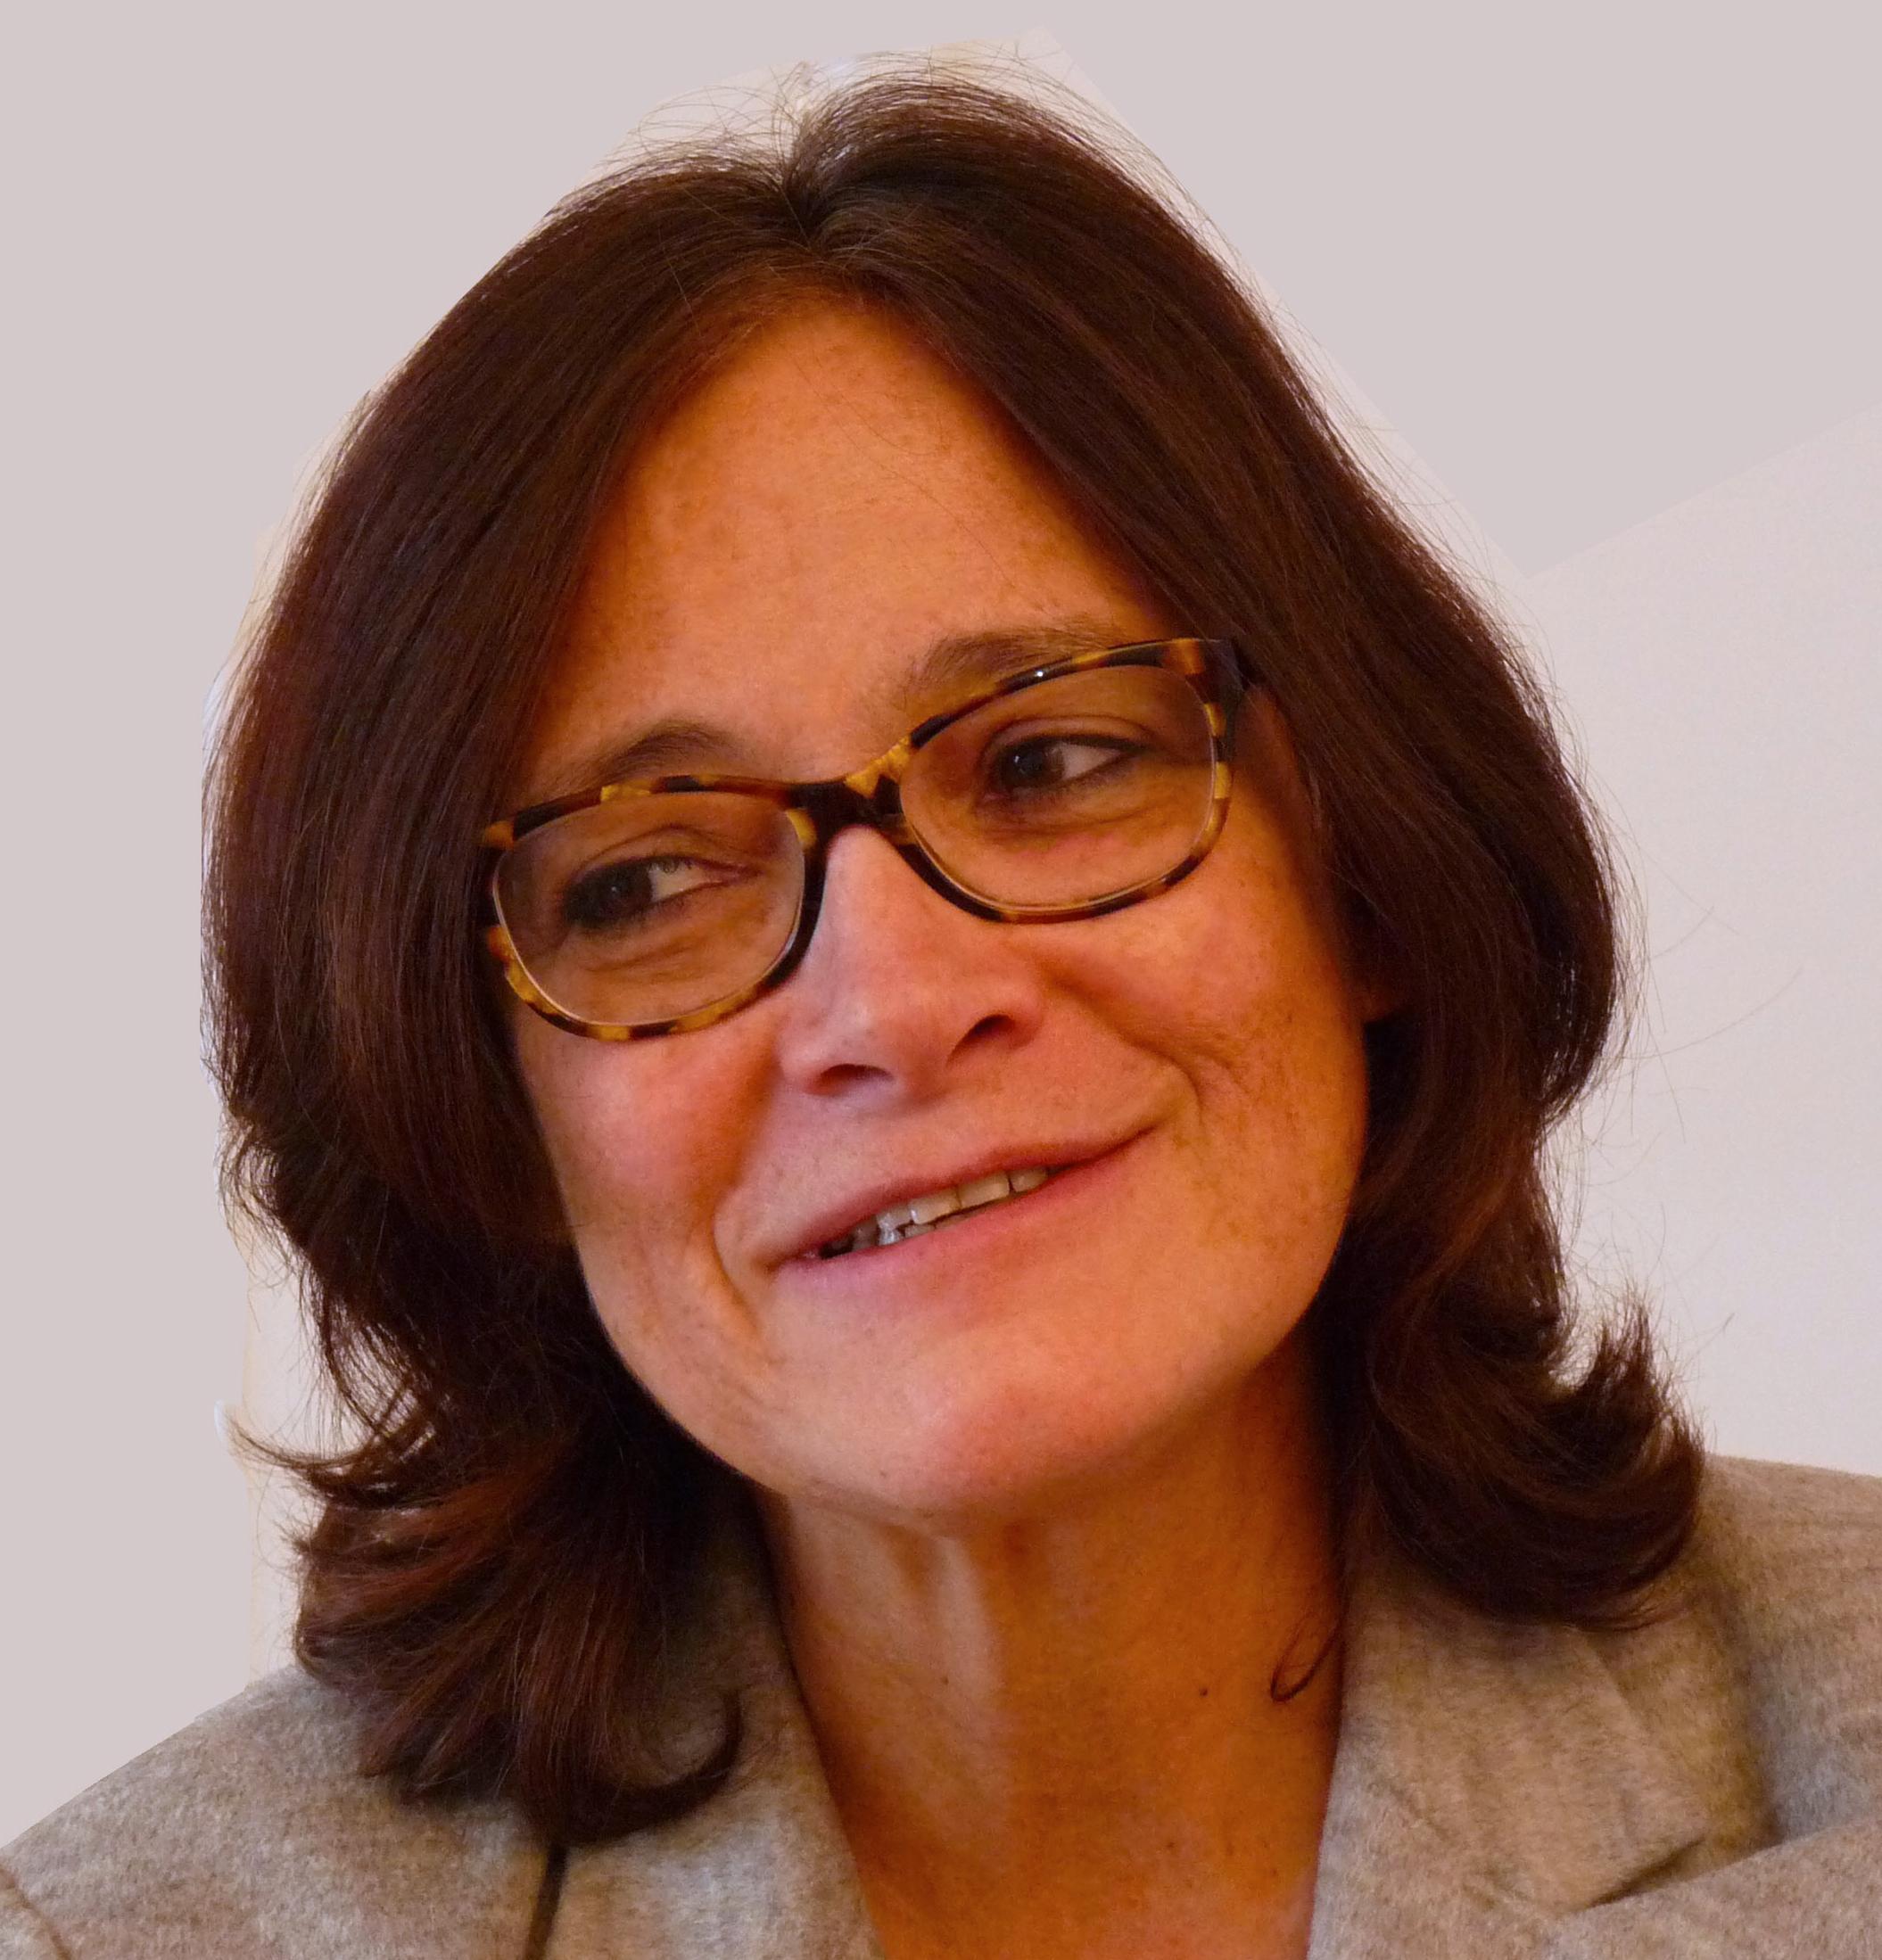 Valérie Rozé